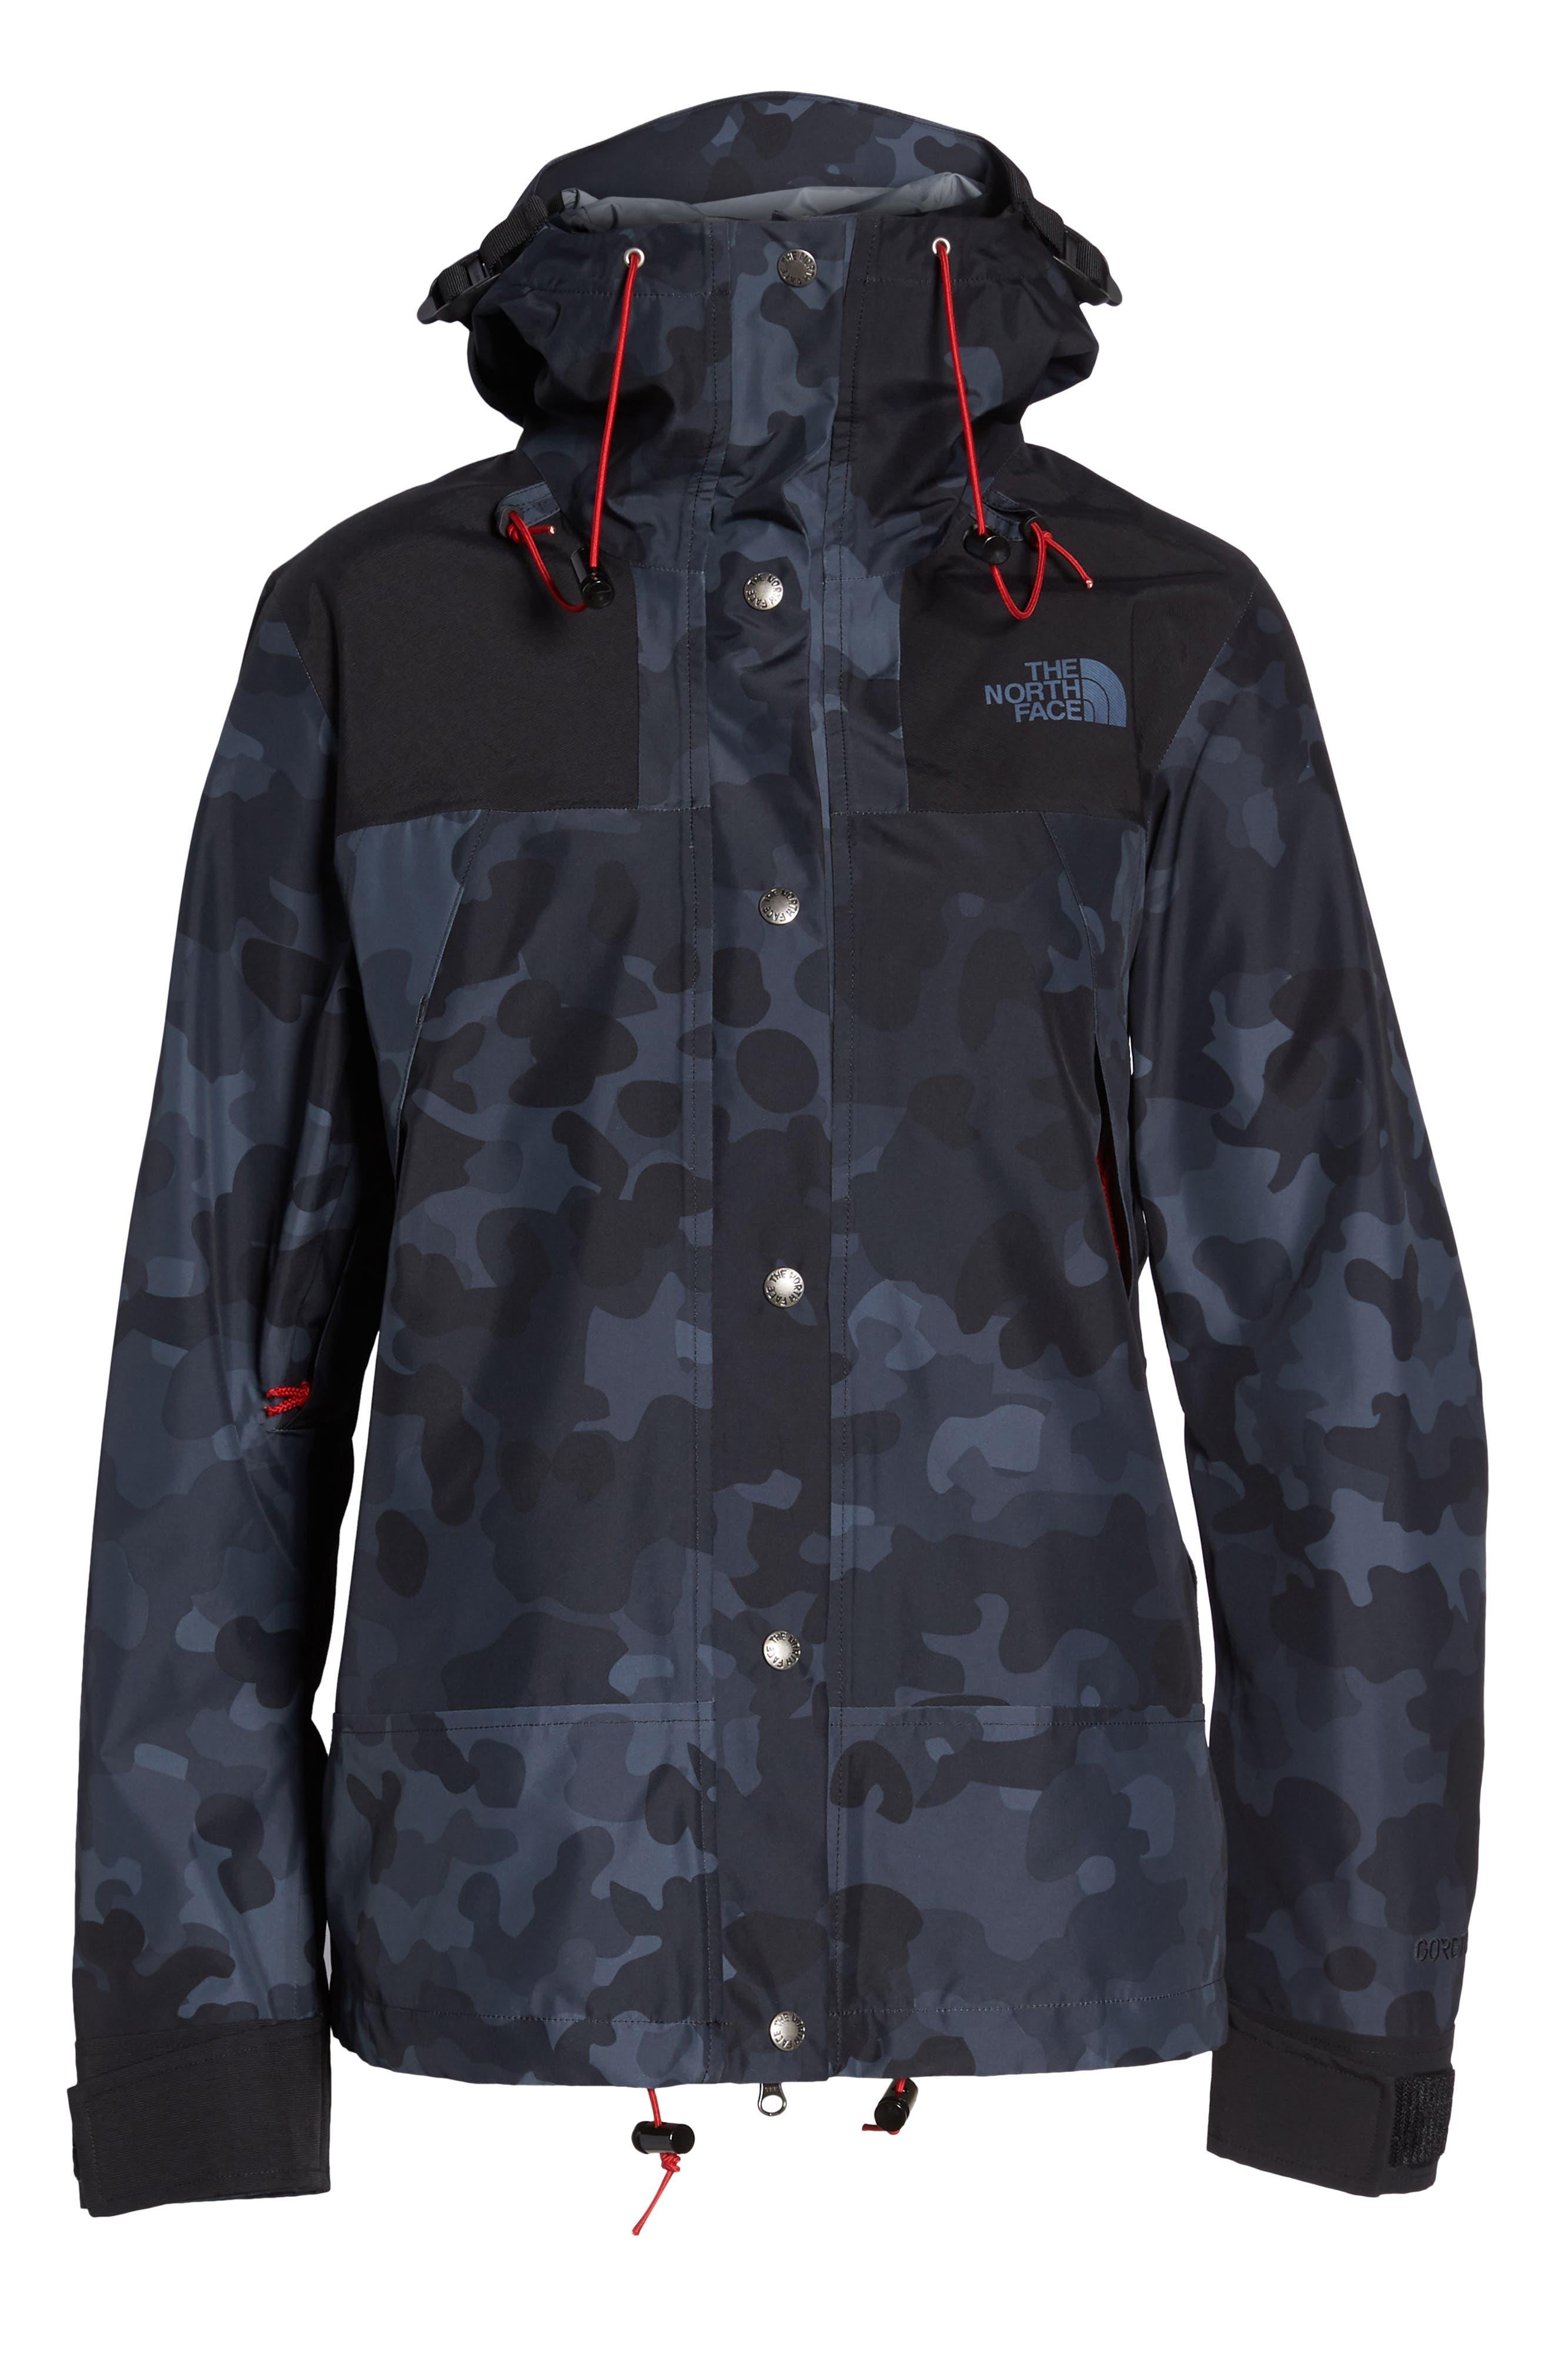 1990 Mountain Gore-Tex<sup>®</sup> Waterproof Jacket,                             Alternate thumbnail 6, color,                             TNF BLACK MACROFLECK PRINT